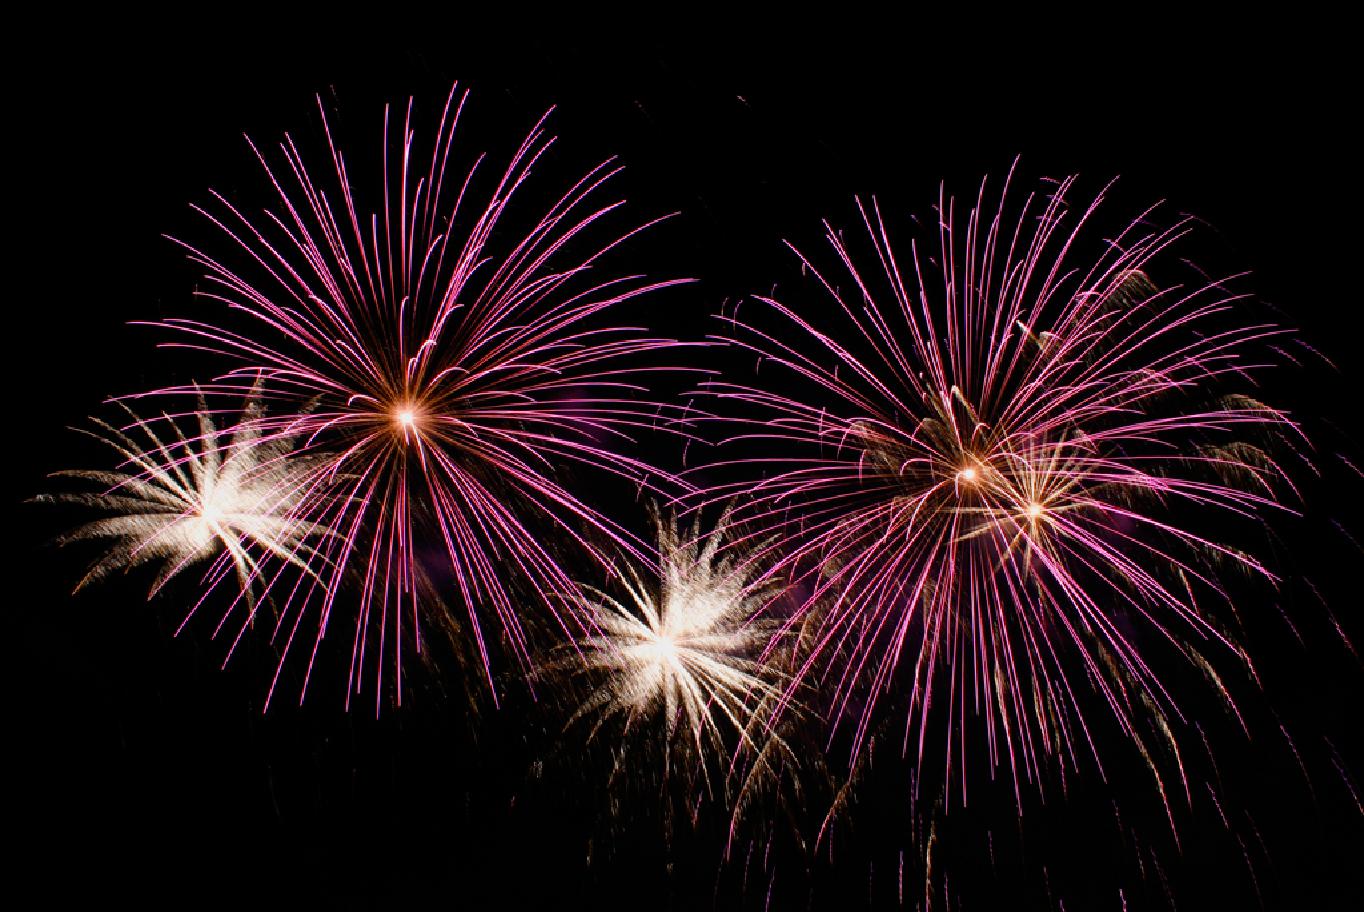 Fireworks Display and Bonfire at Cammas Hall Farm